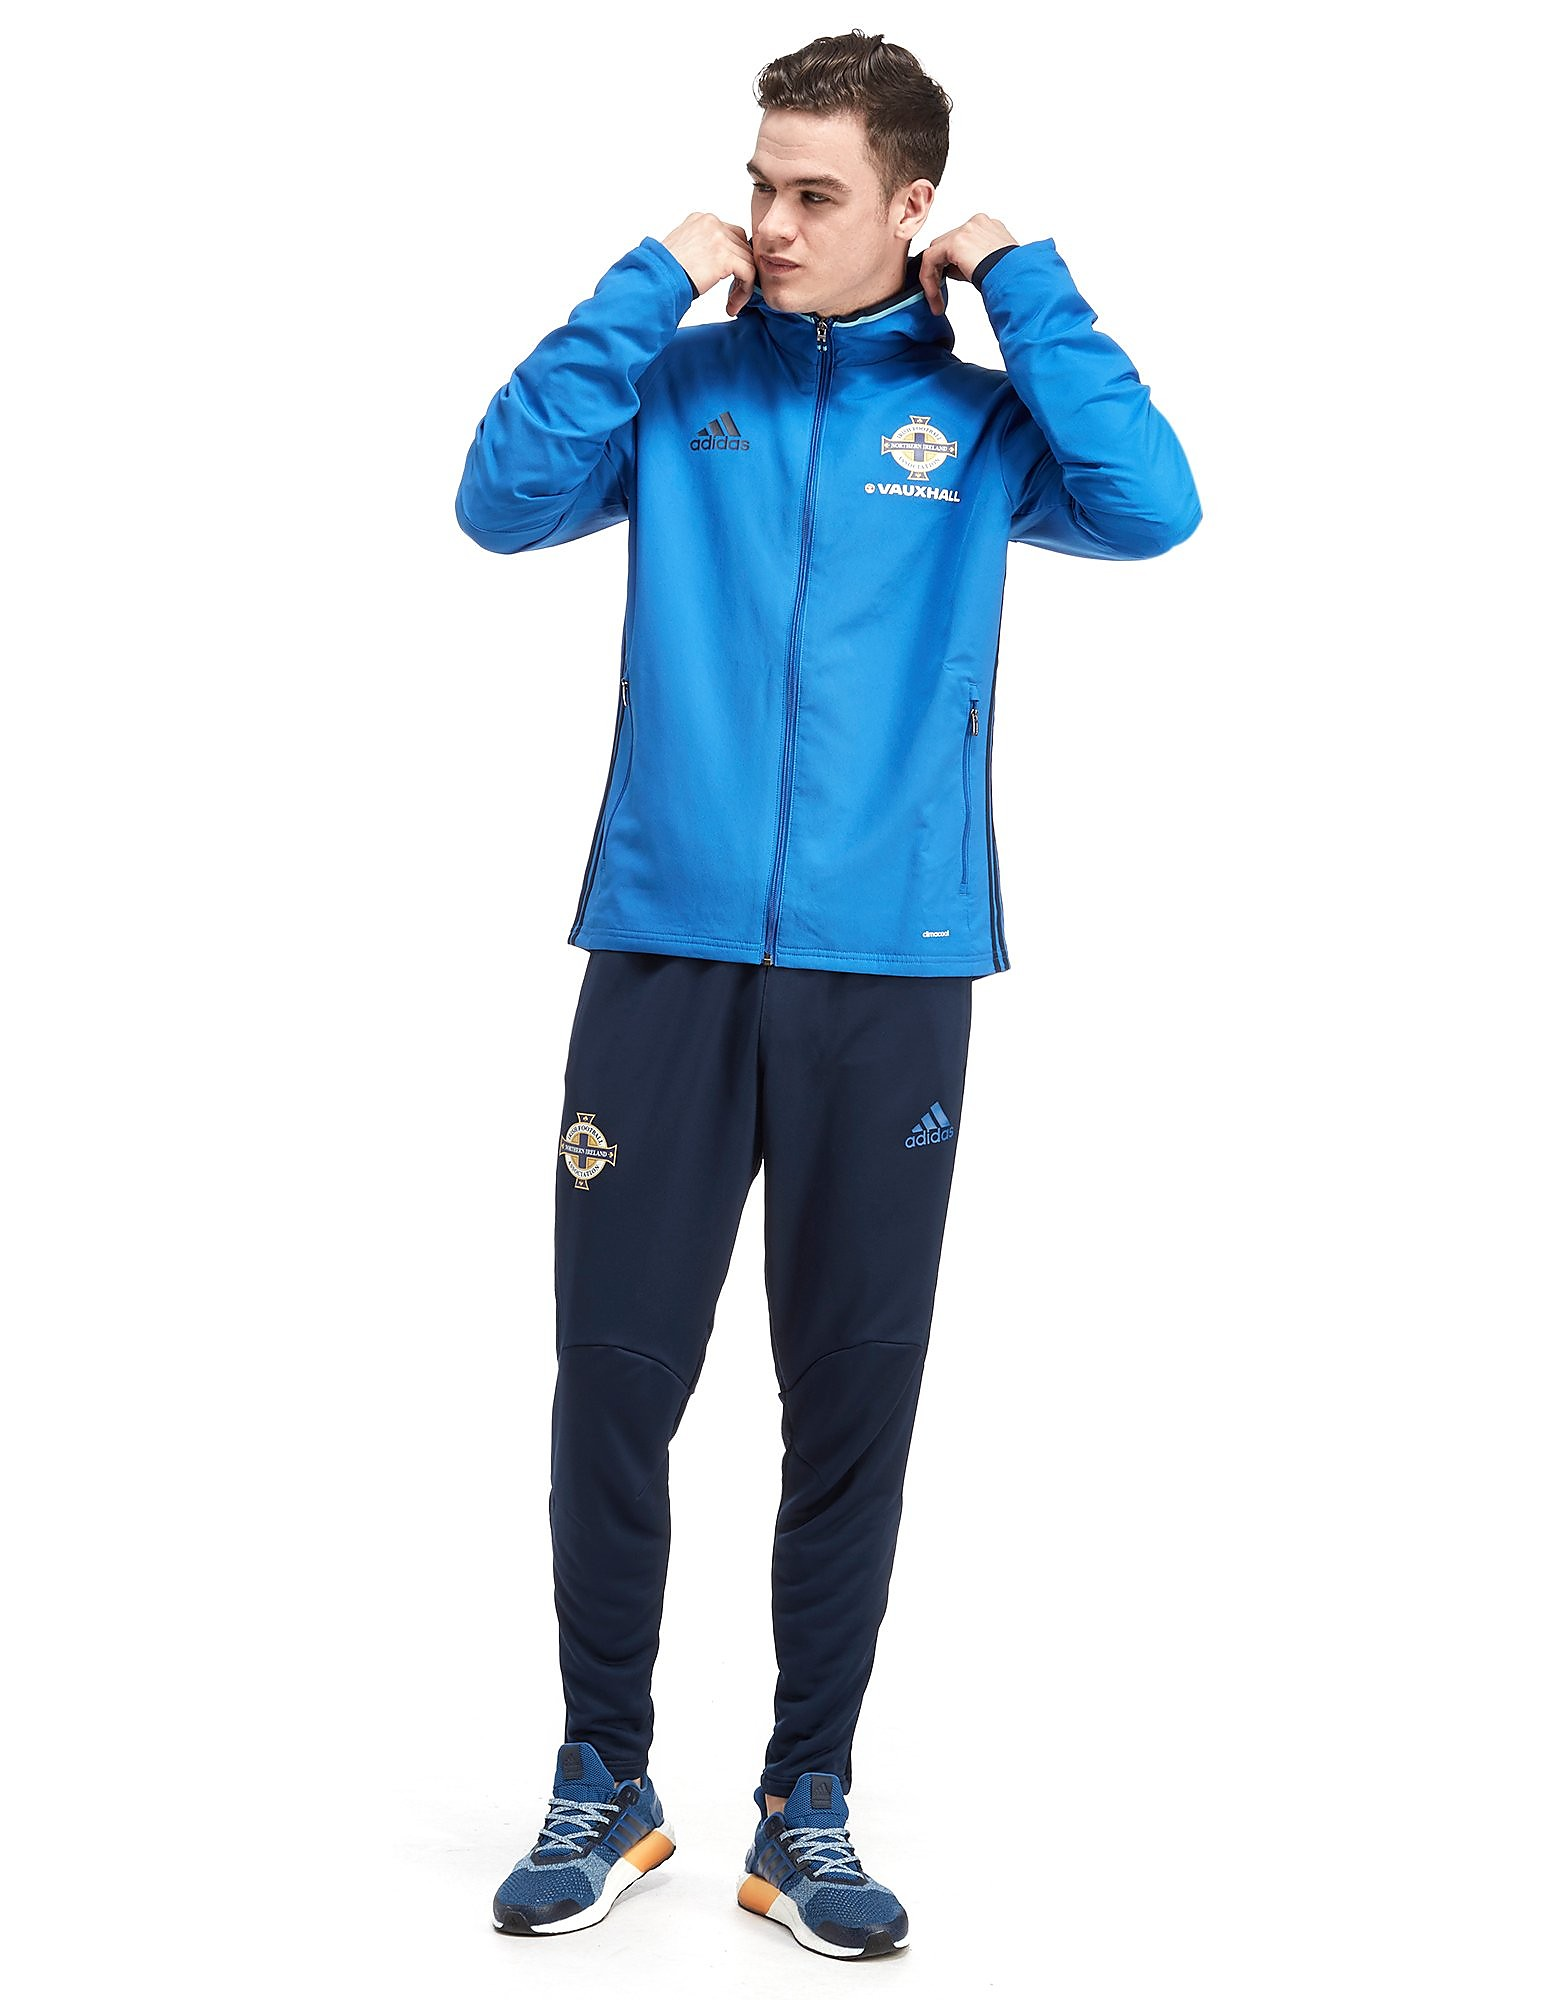 adidas Northern Ireland 2016/17 Presentation Suit